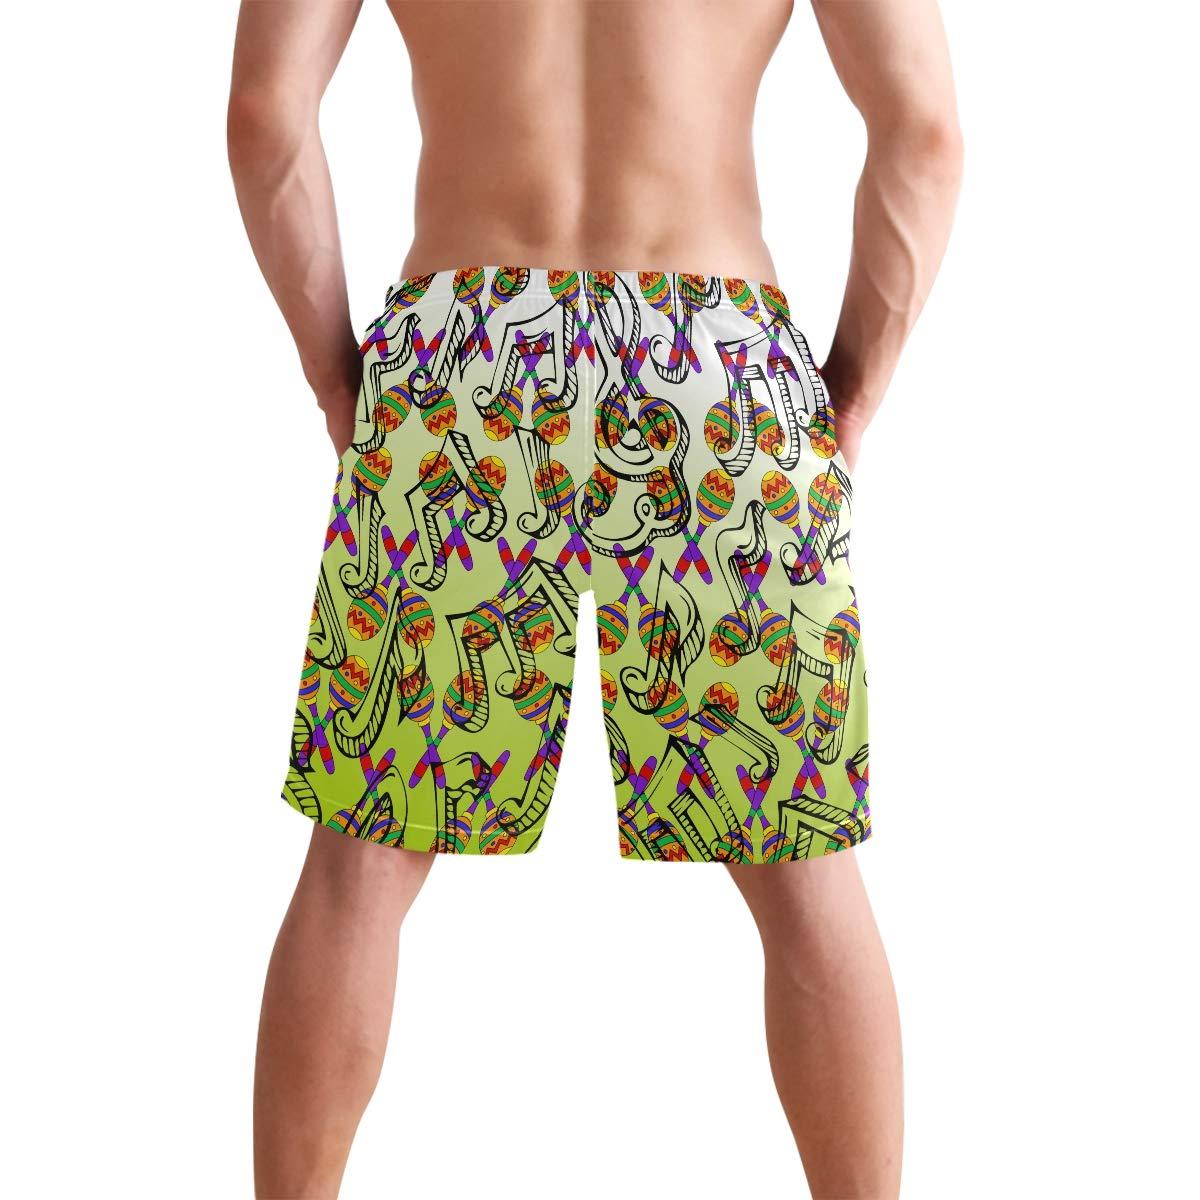 DongDongQiang Men Summer Mexican Maracas Instruments Quick Dry Volleyball Beach Shorts Board Shorts